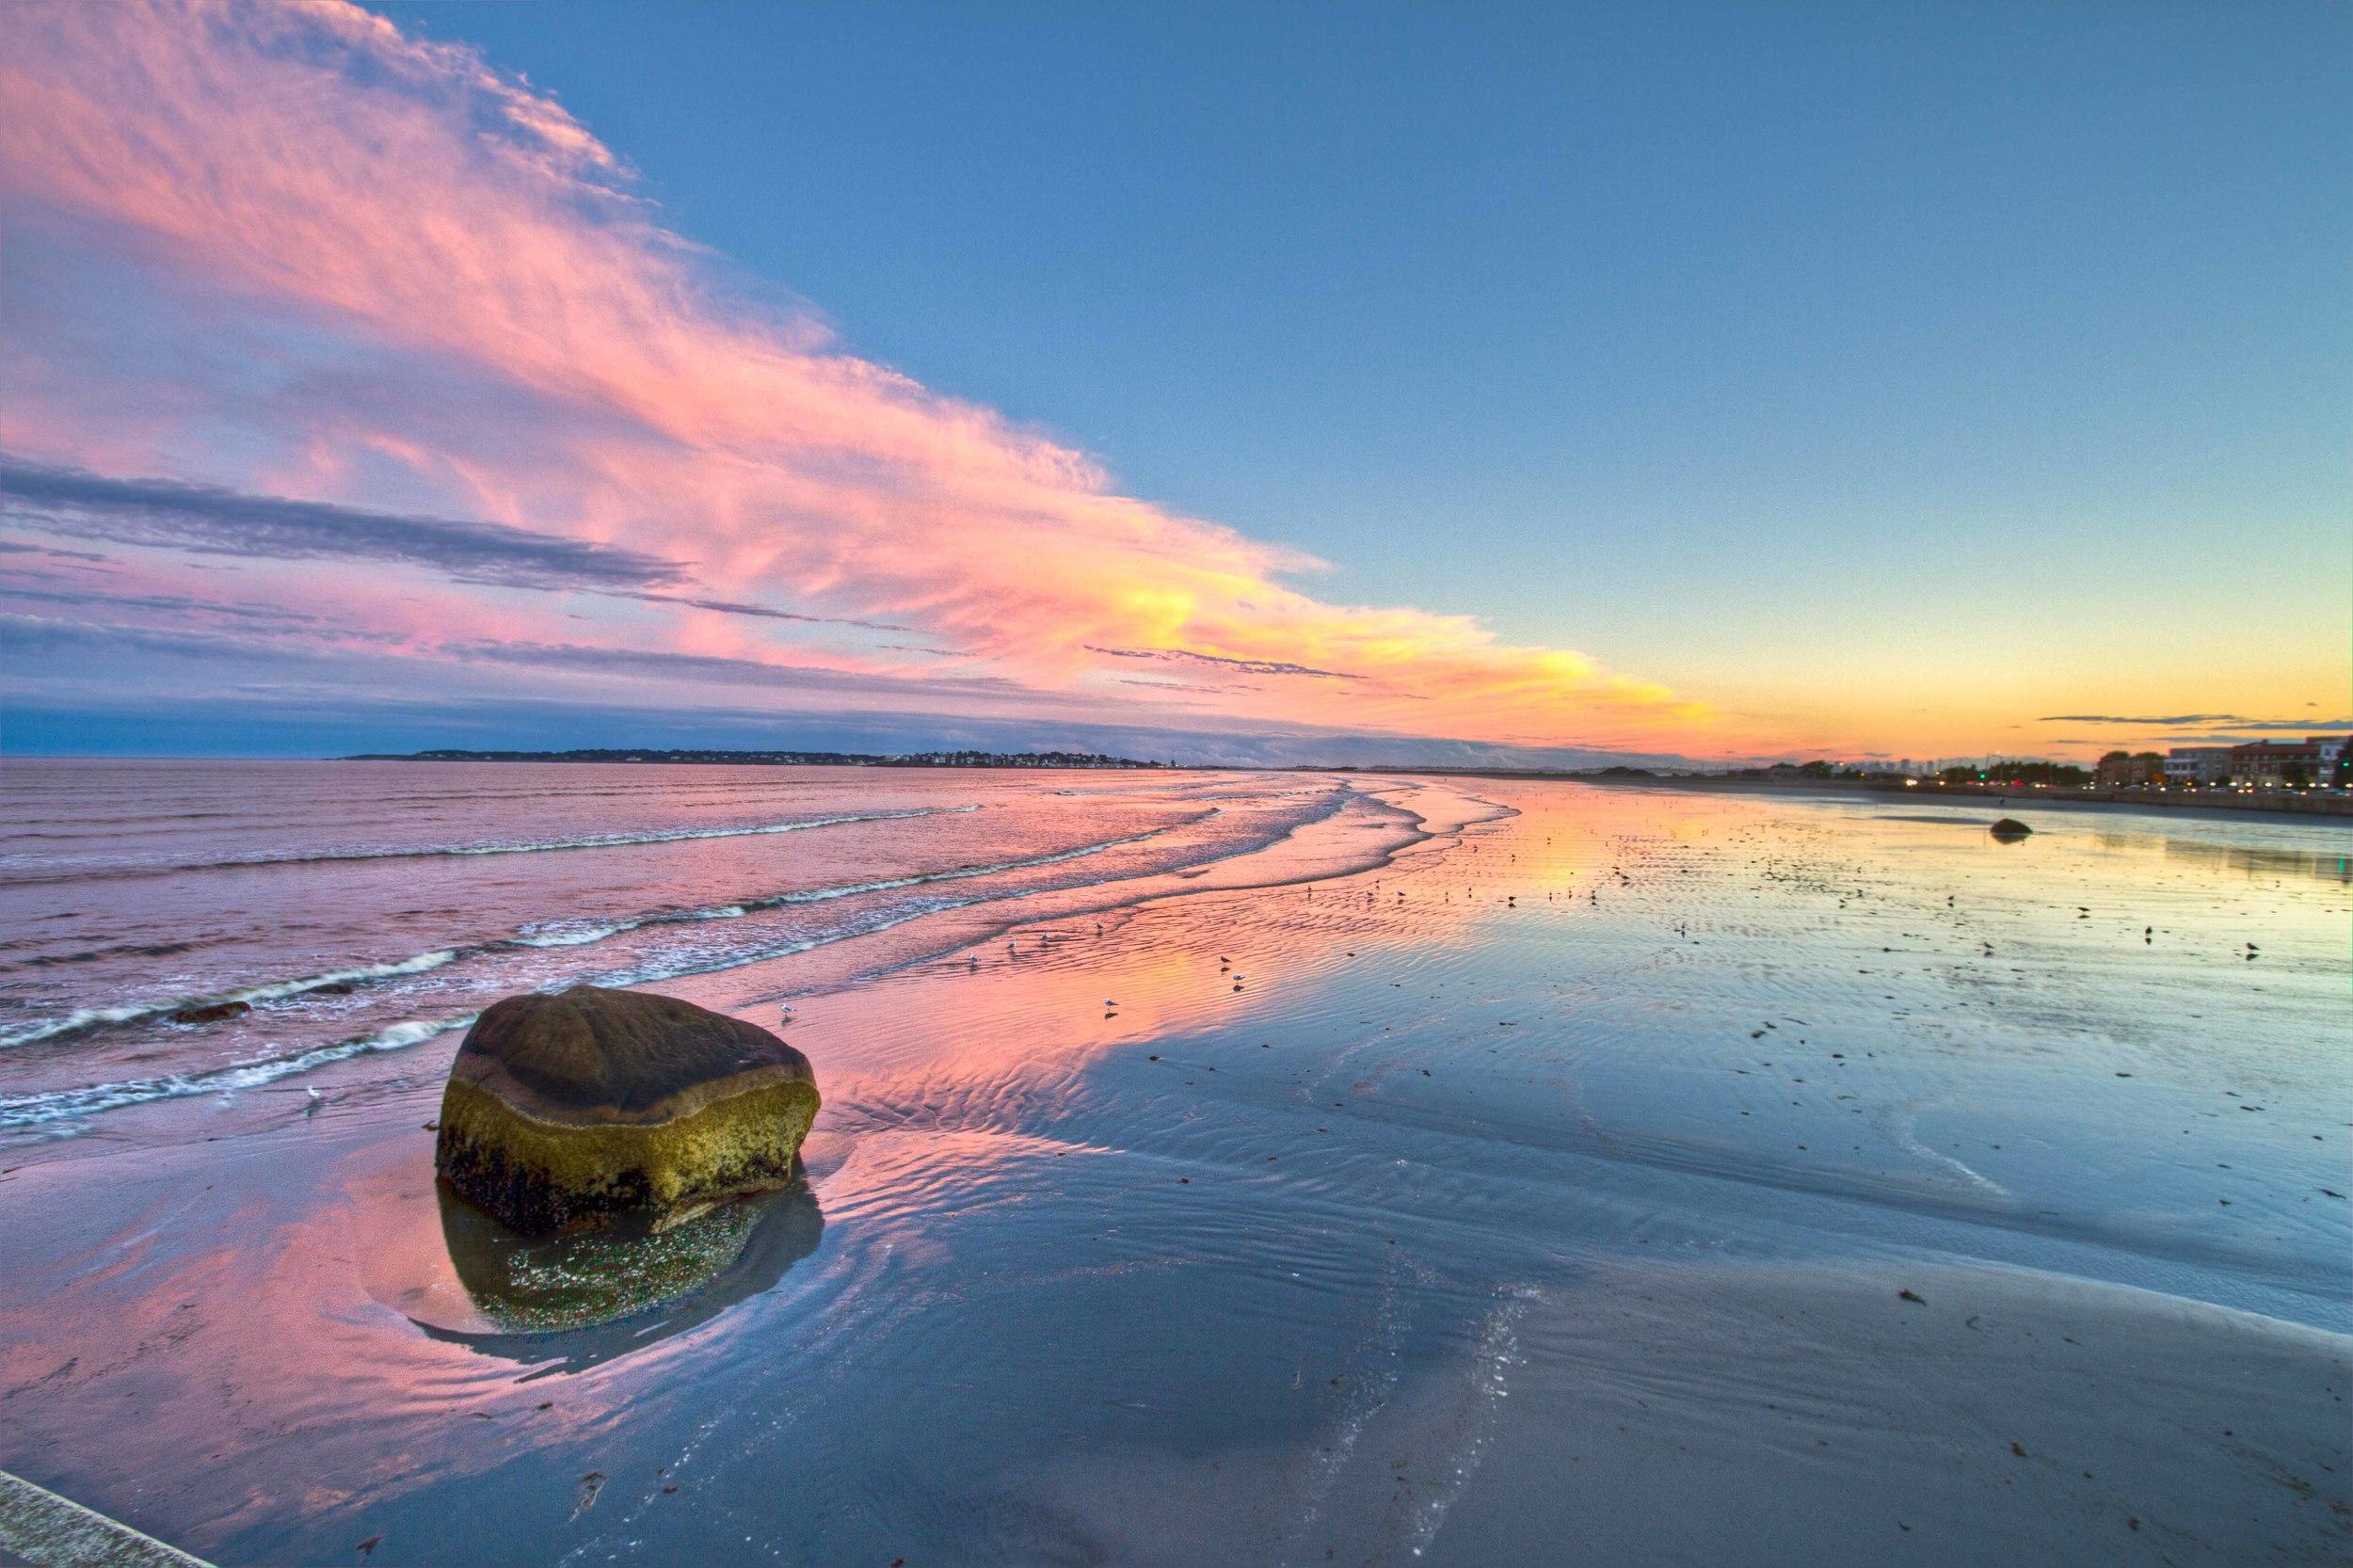 Lynn Shore Drive Sunset